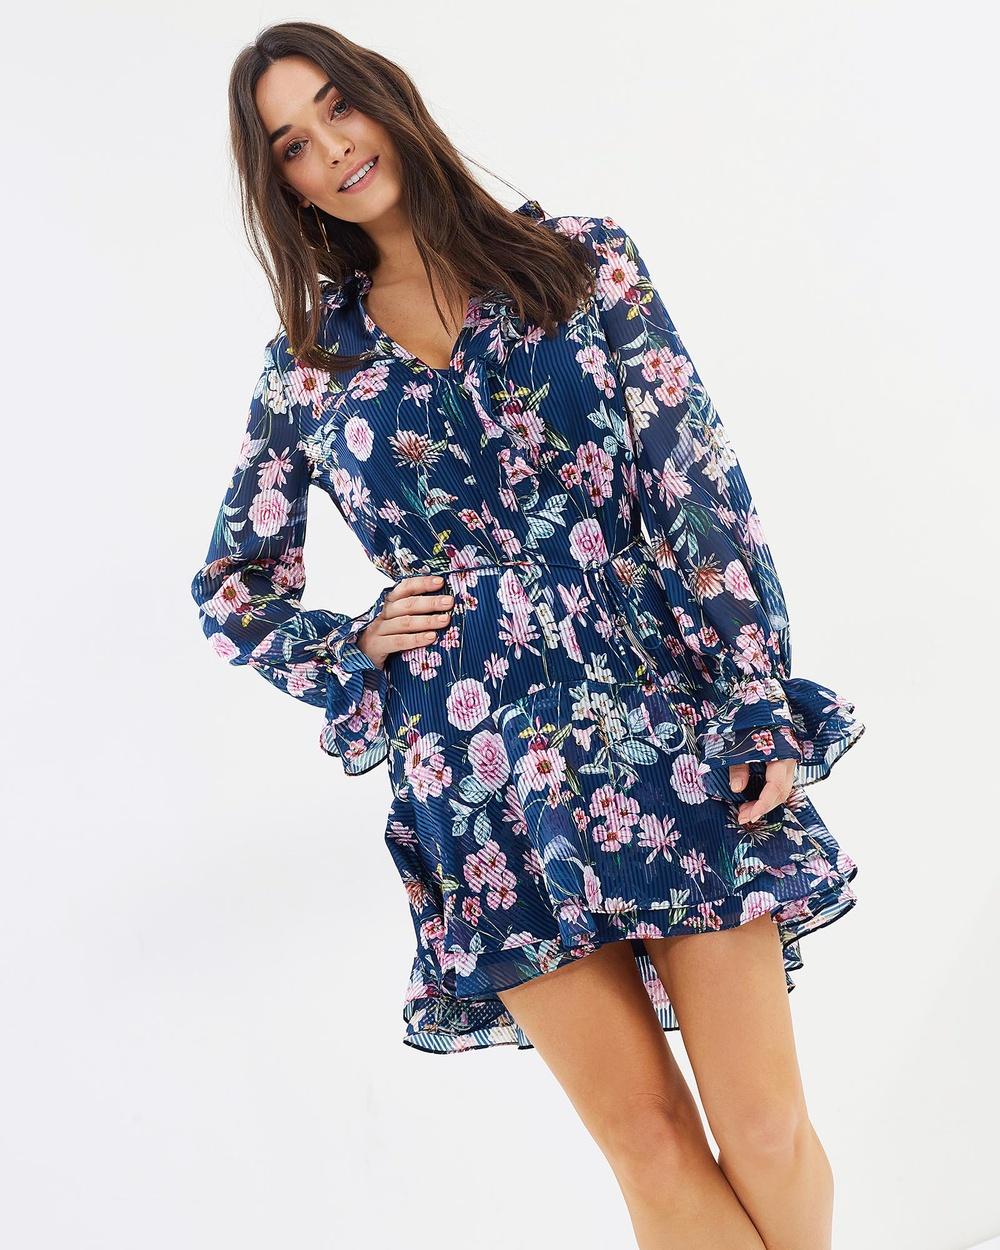 Cooper St Rita Long Sleeve Mini Dress Printed Dresses Print Rita Long Sleeve Mini Dress